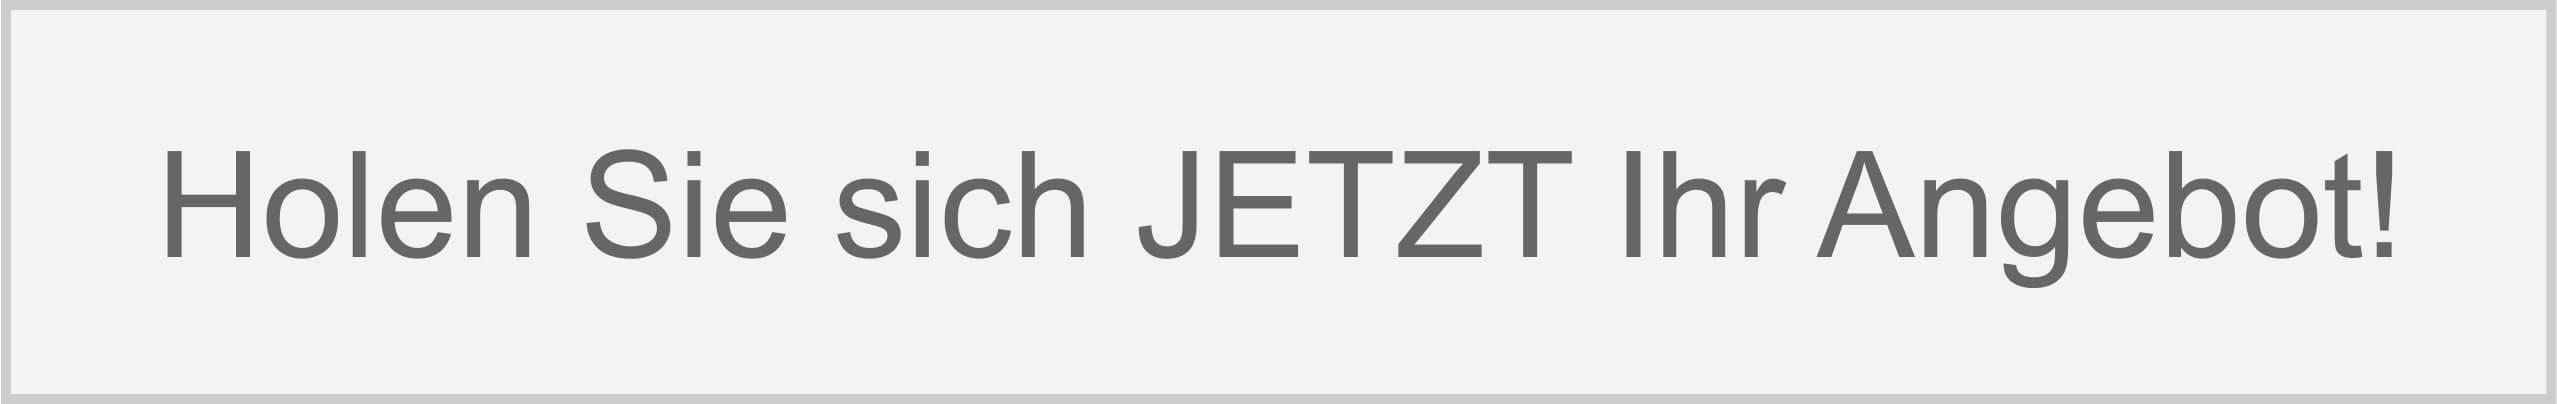 Angebot zum refurben privater iPhones bei MobileWorld in Linz